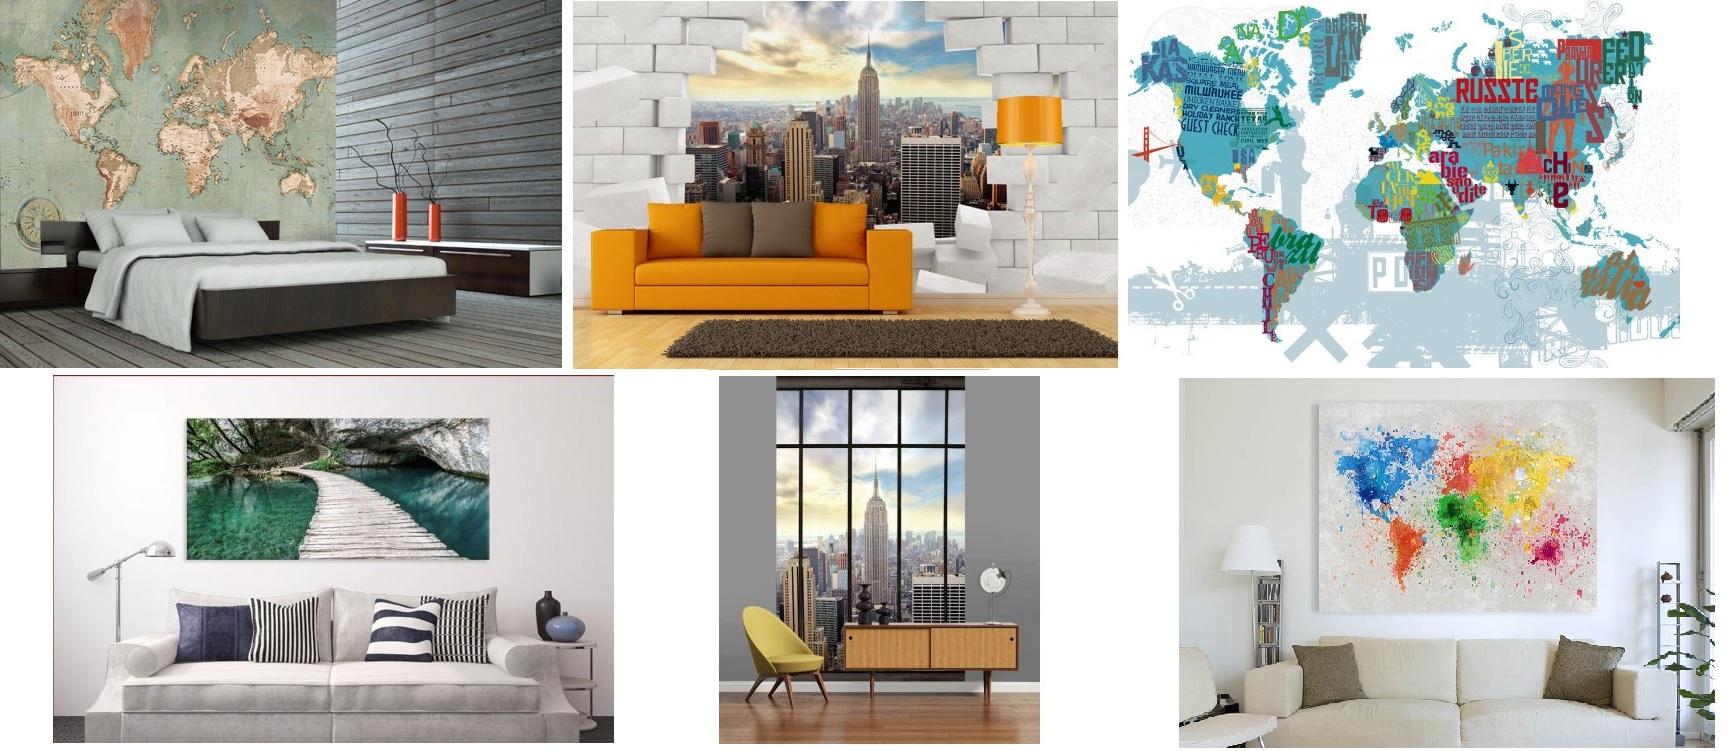 tableau trompe loeil moderne effet trompe luil design. Black Bedroom Furniture Sets. Home Design Ideas